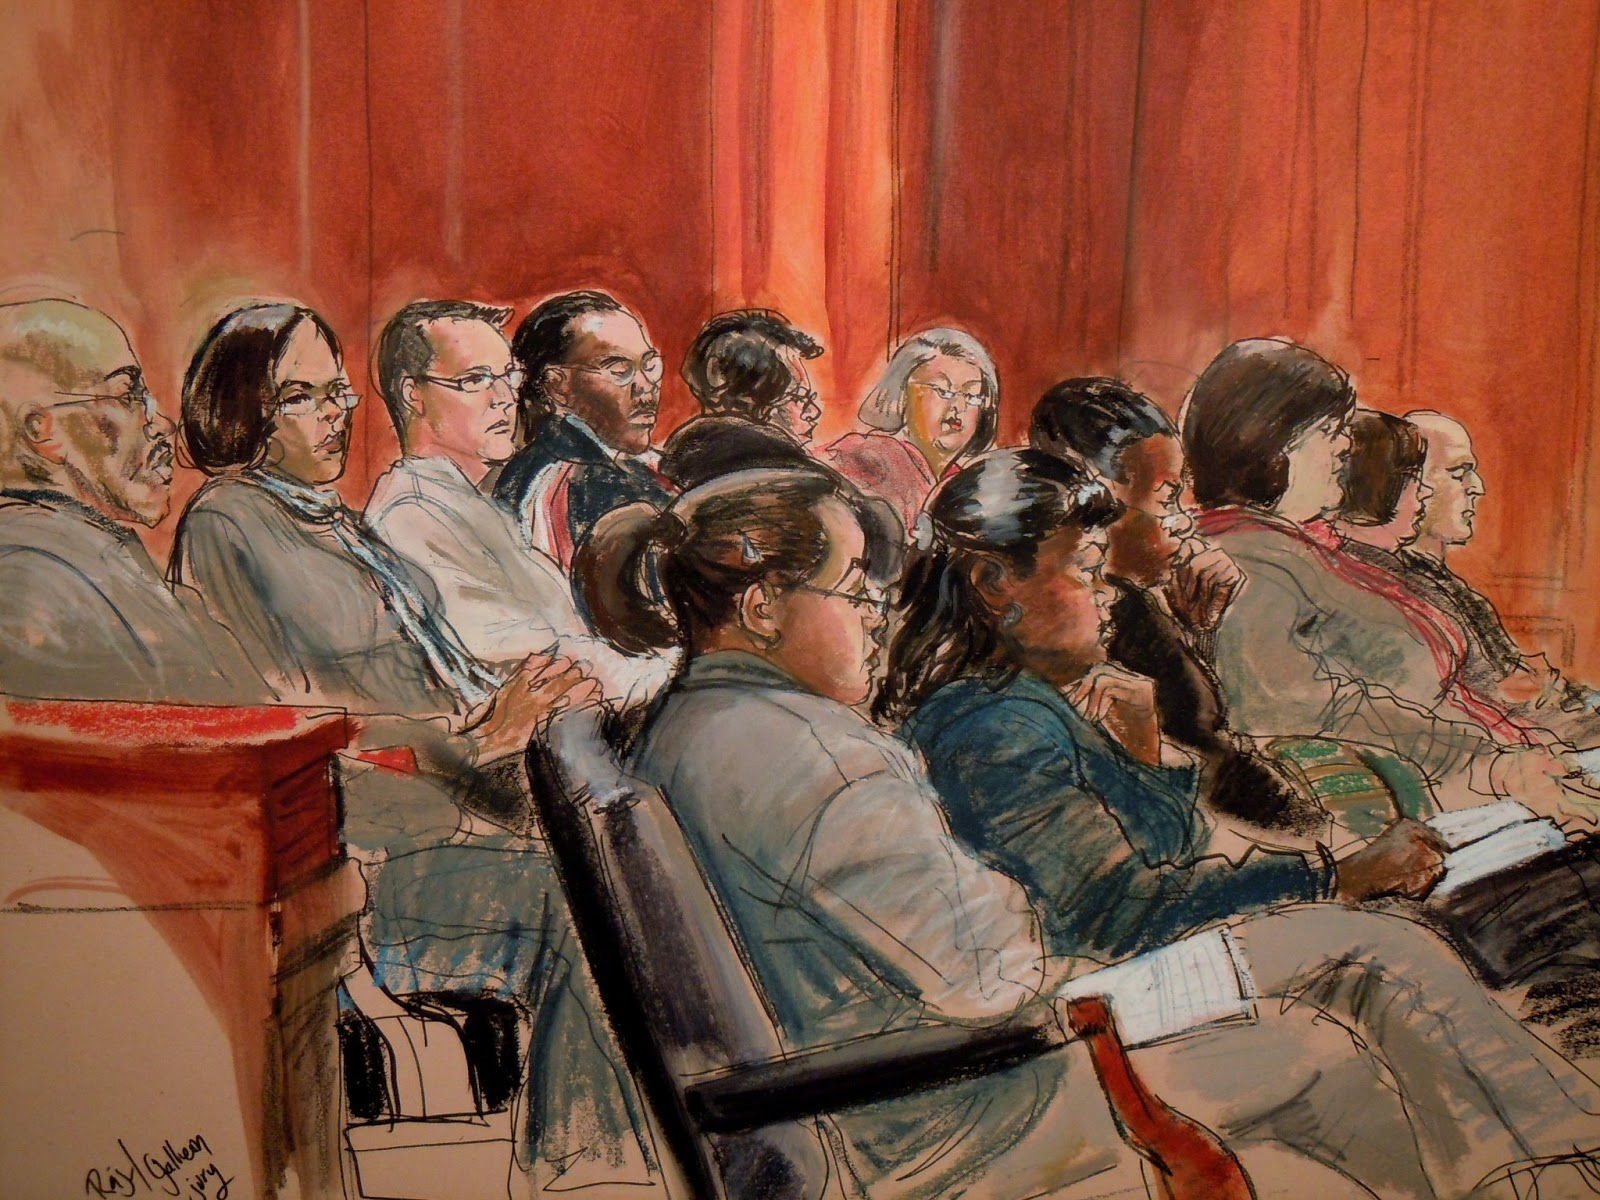 ILLUSTRATED COURTROOM: Raj Rajaratnam Insider Trading ...